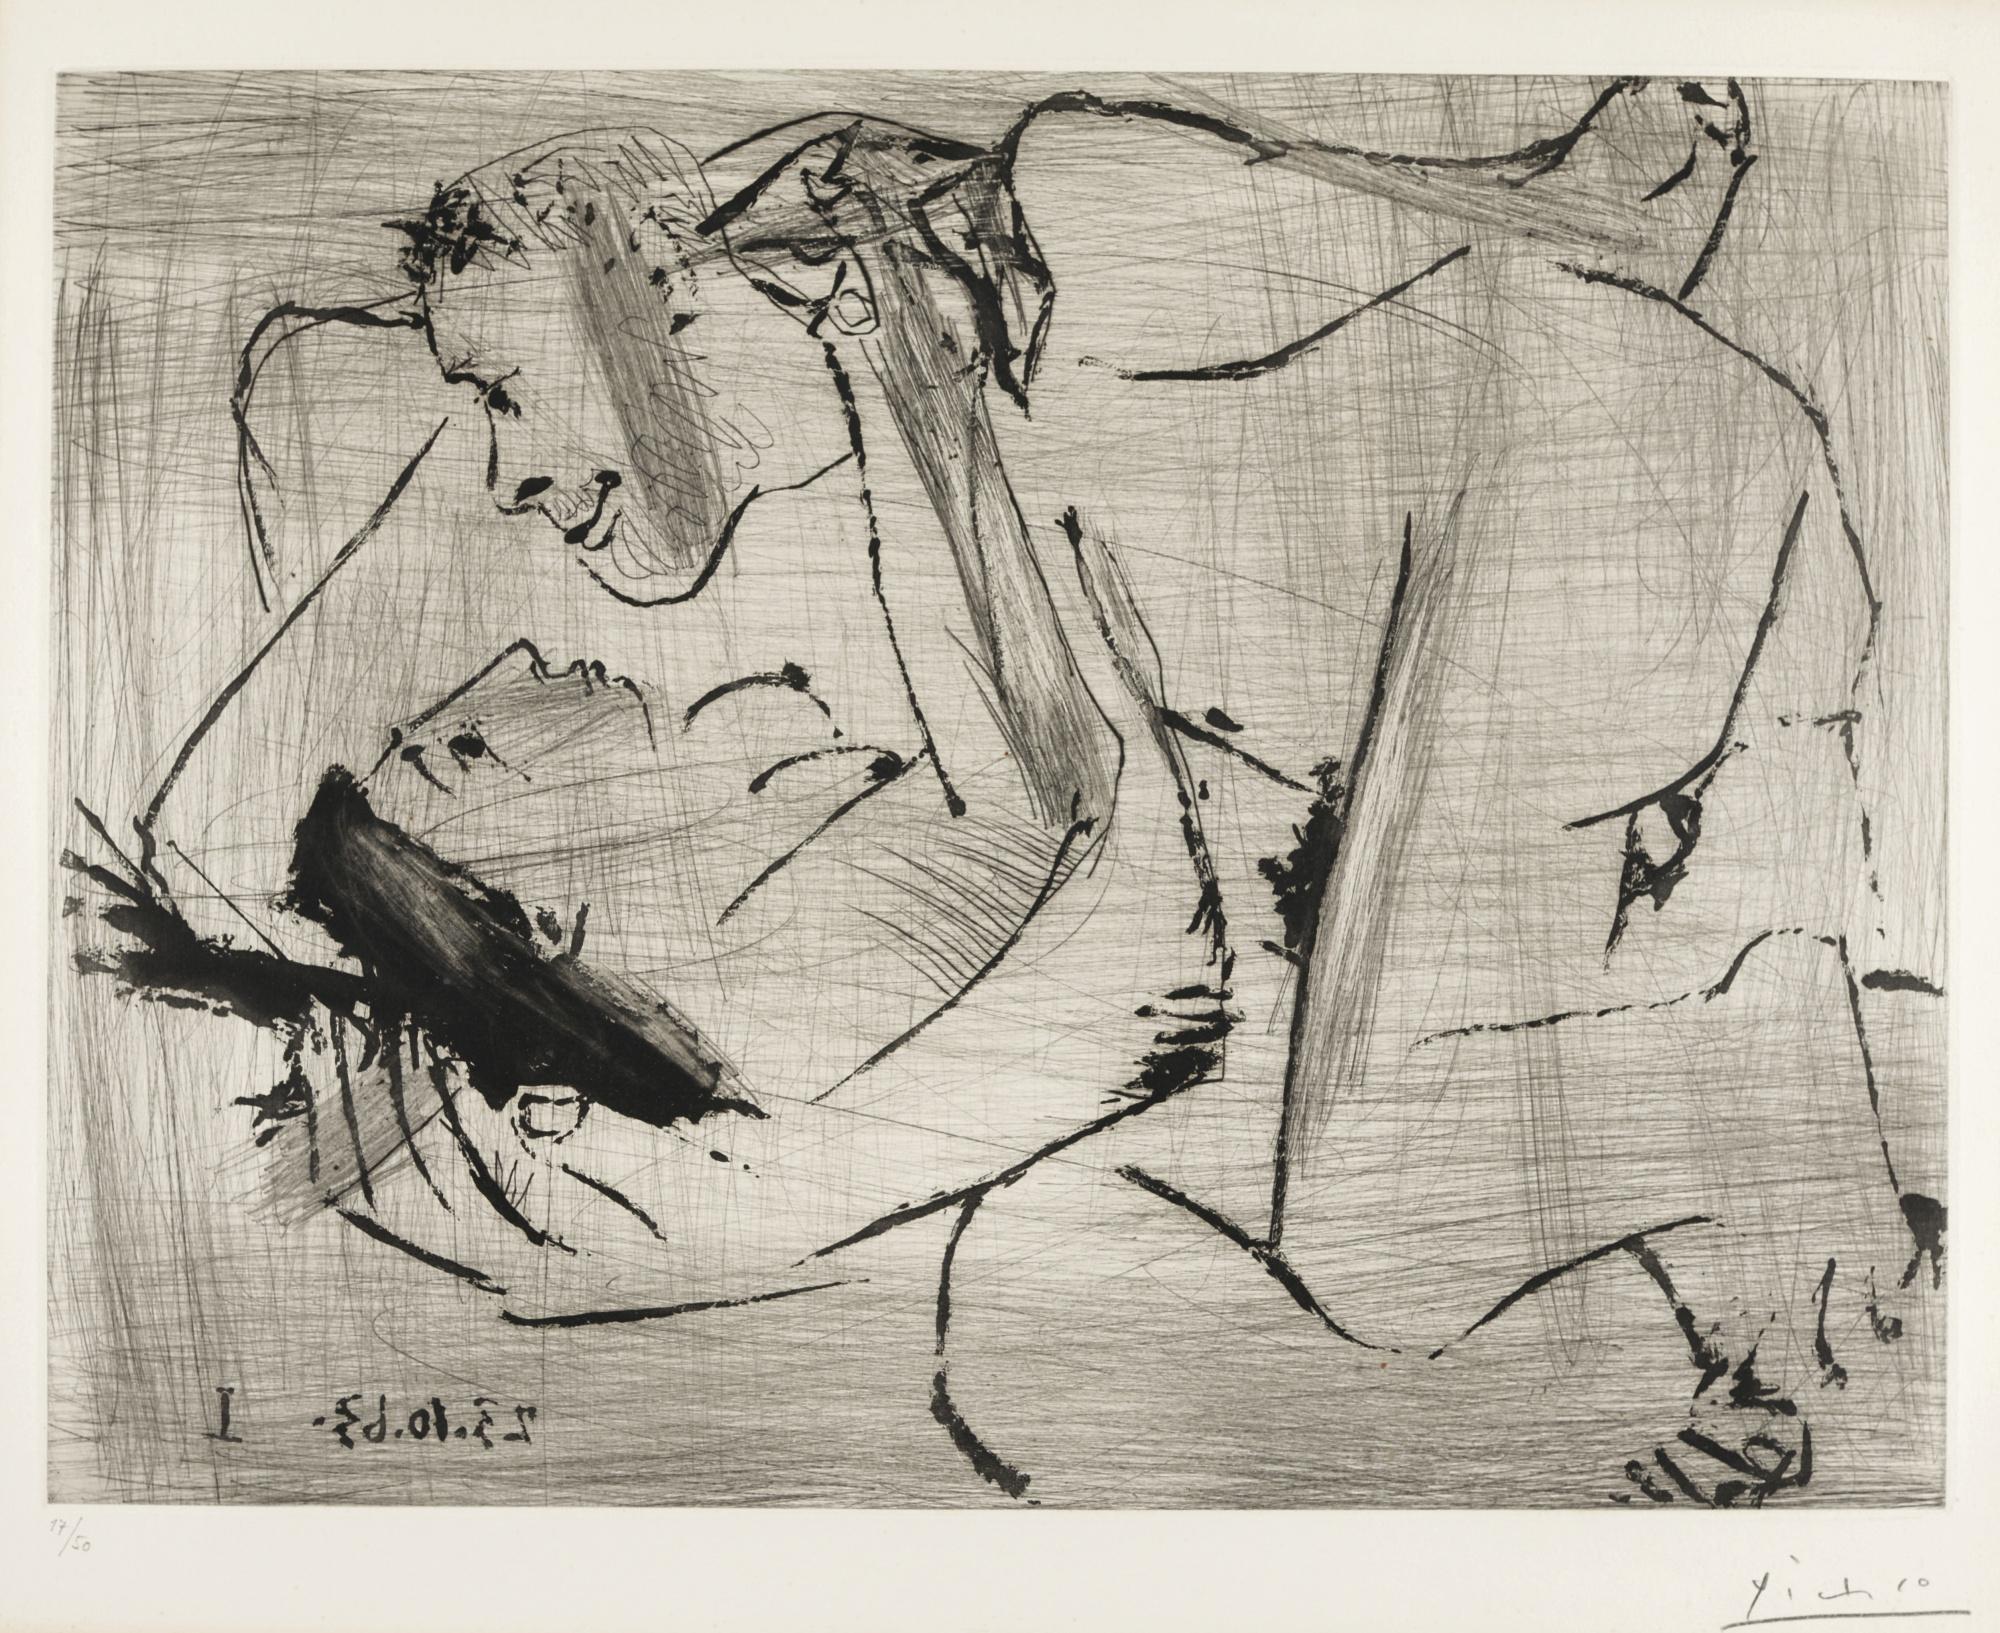 Pablo Picasso-L'Etreinte (B. 1115; Ba. 1108)-1963